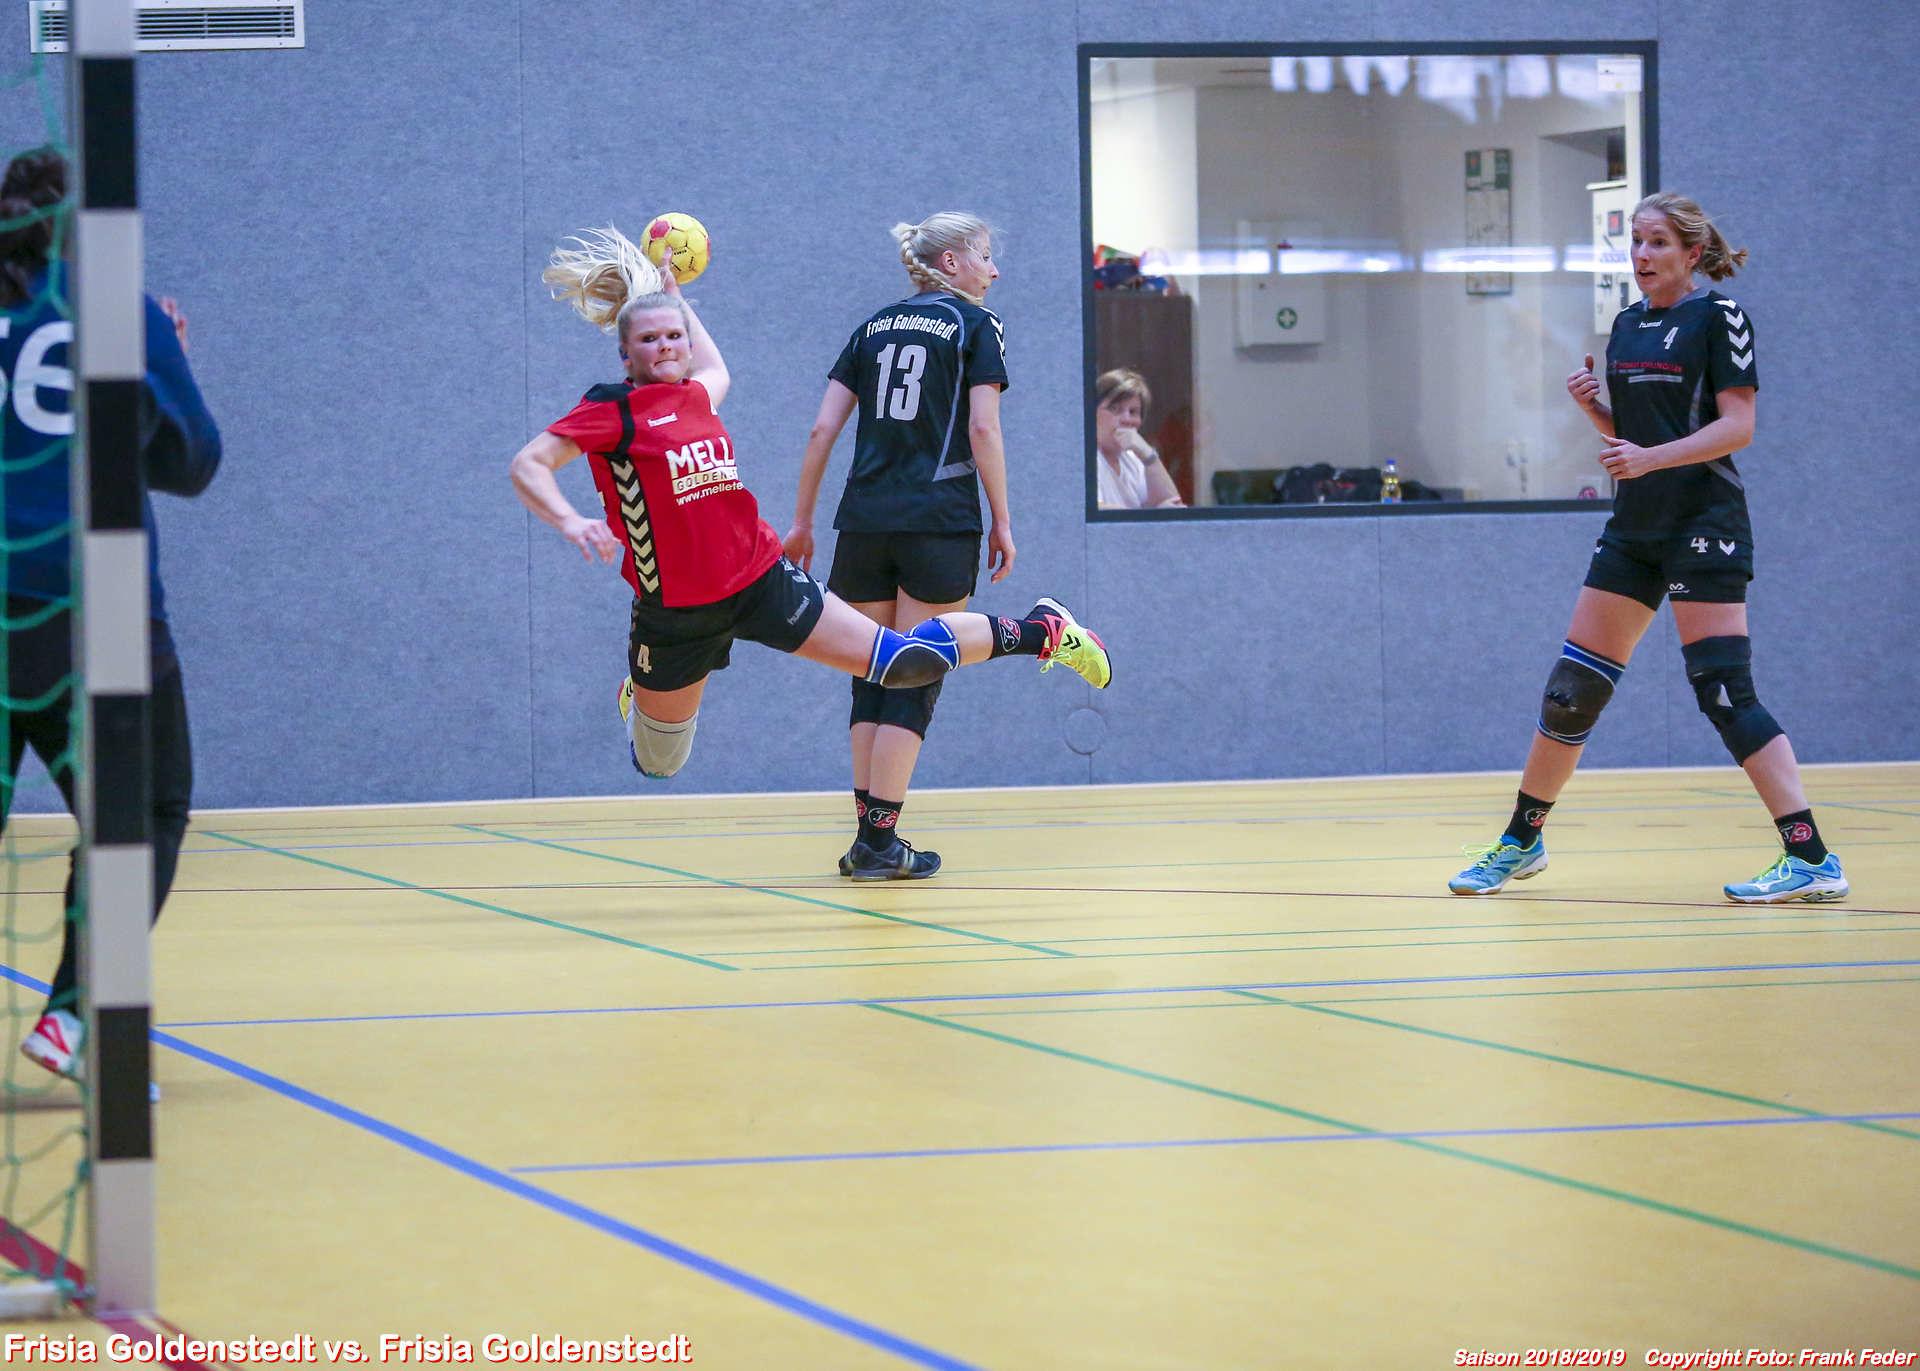 WEB_01-Frisia vs Frisia 2018_09_02_1709_042.jpg